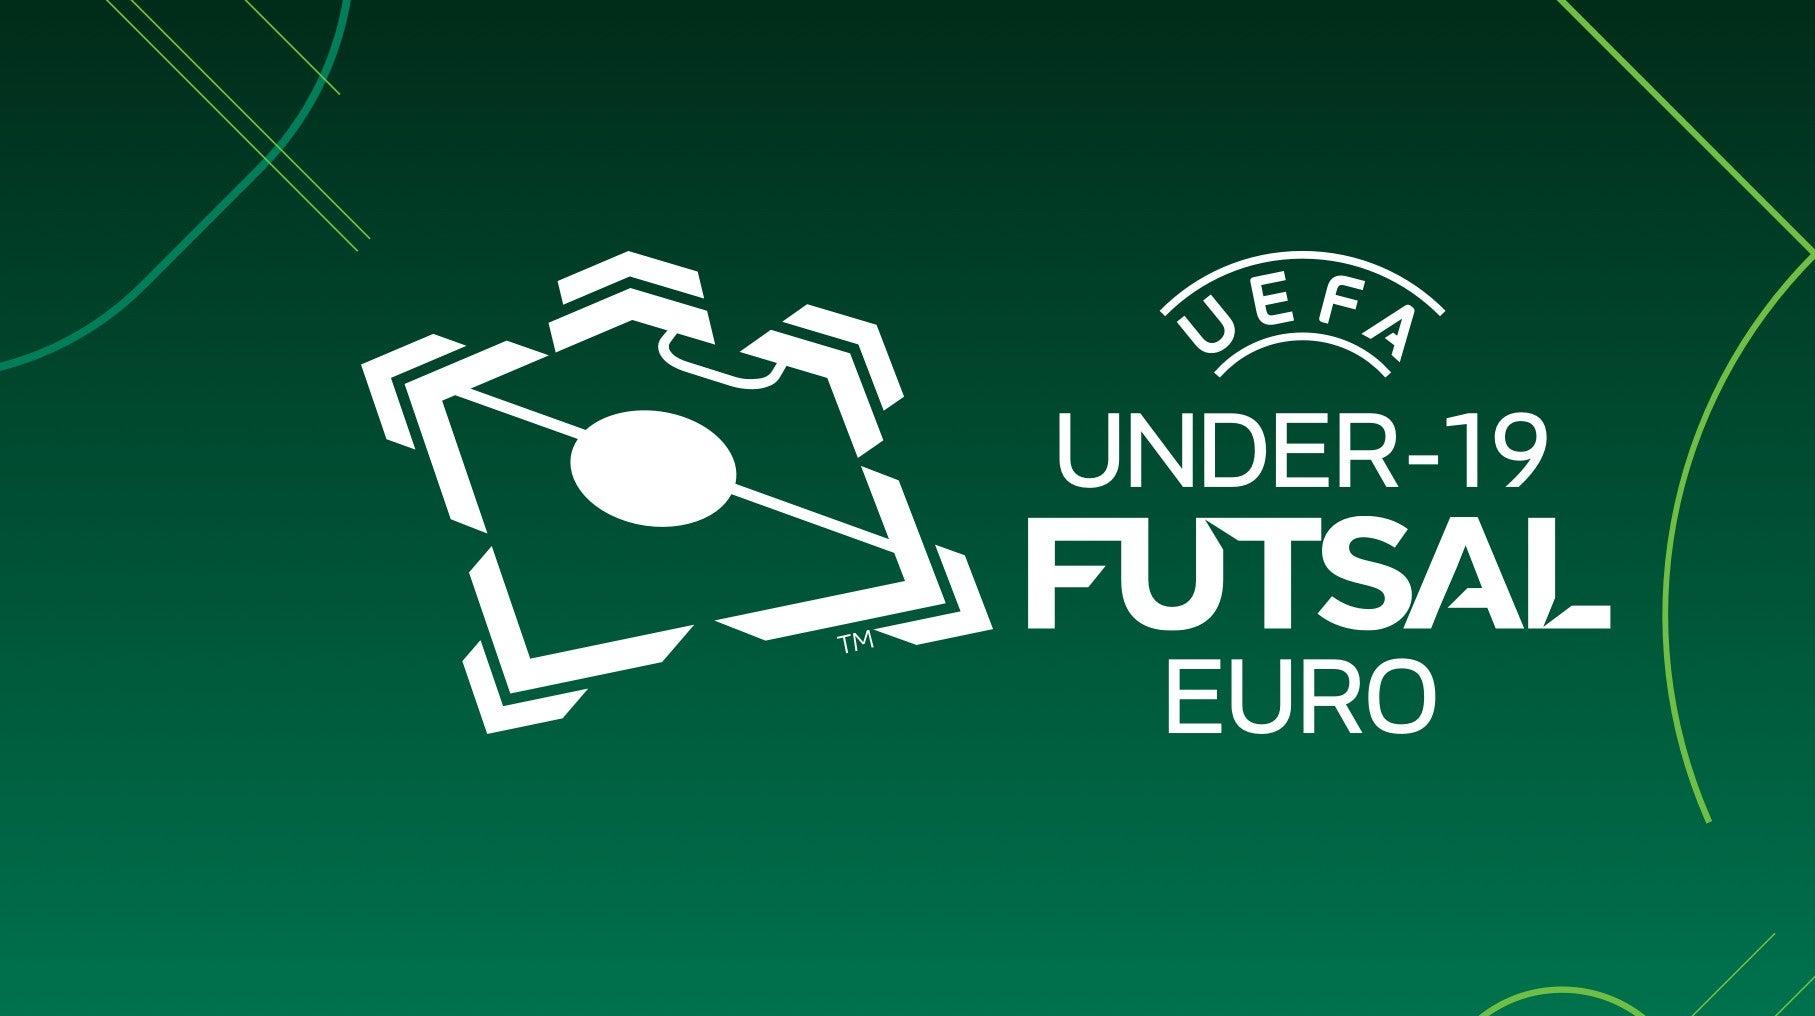 UEFA Campeonato Europeu de Futsal sub-19